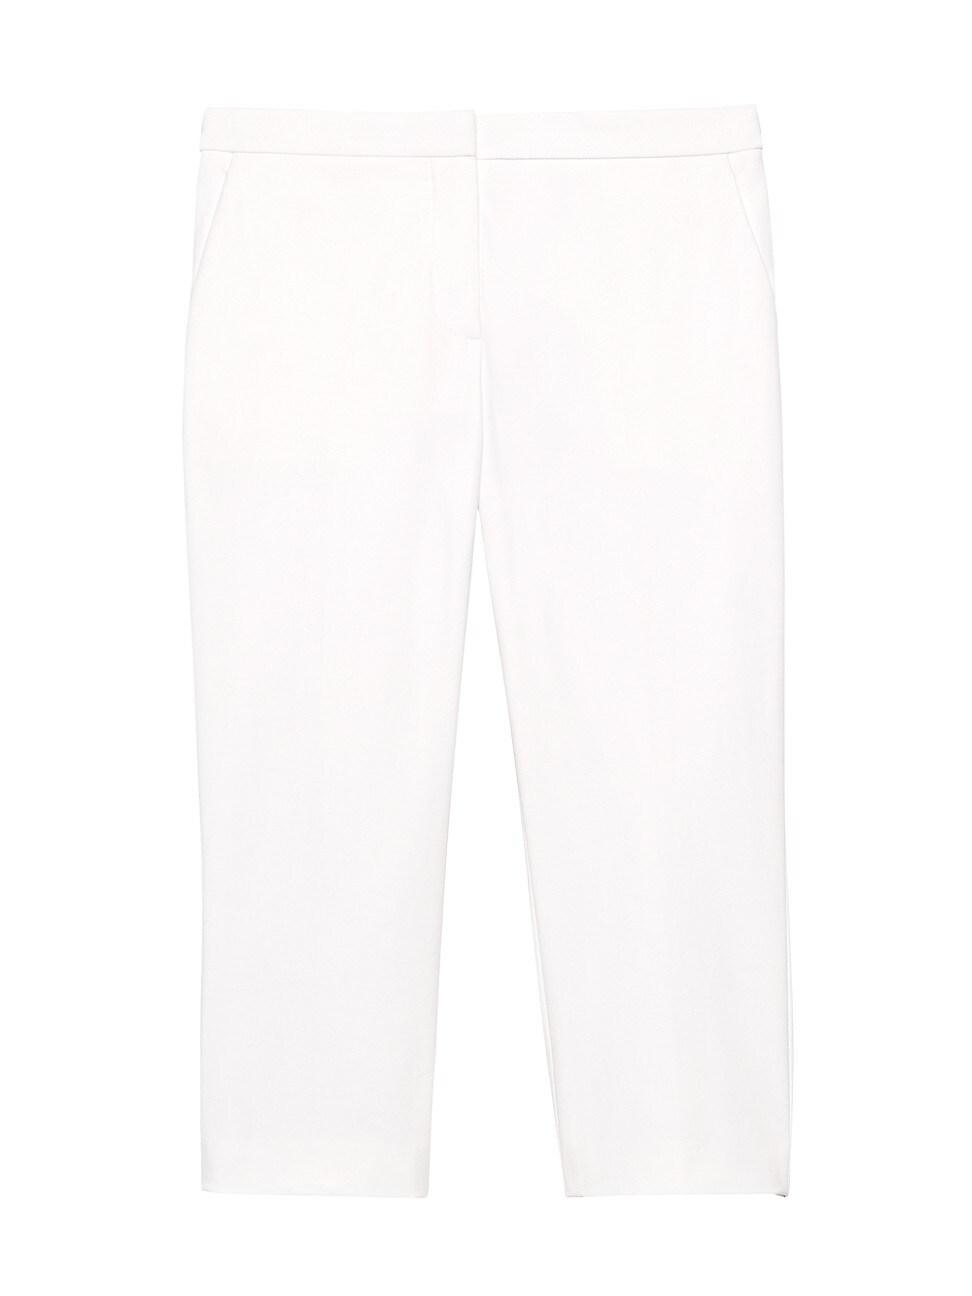 Theory Pants WOMEN'S EASY CAPRI PANTS